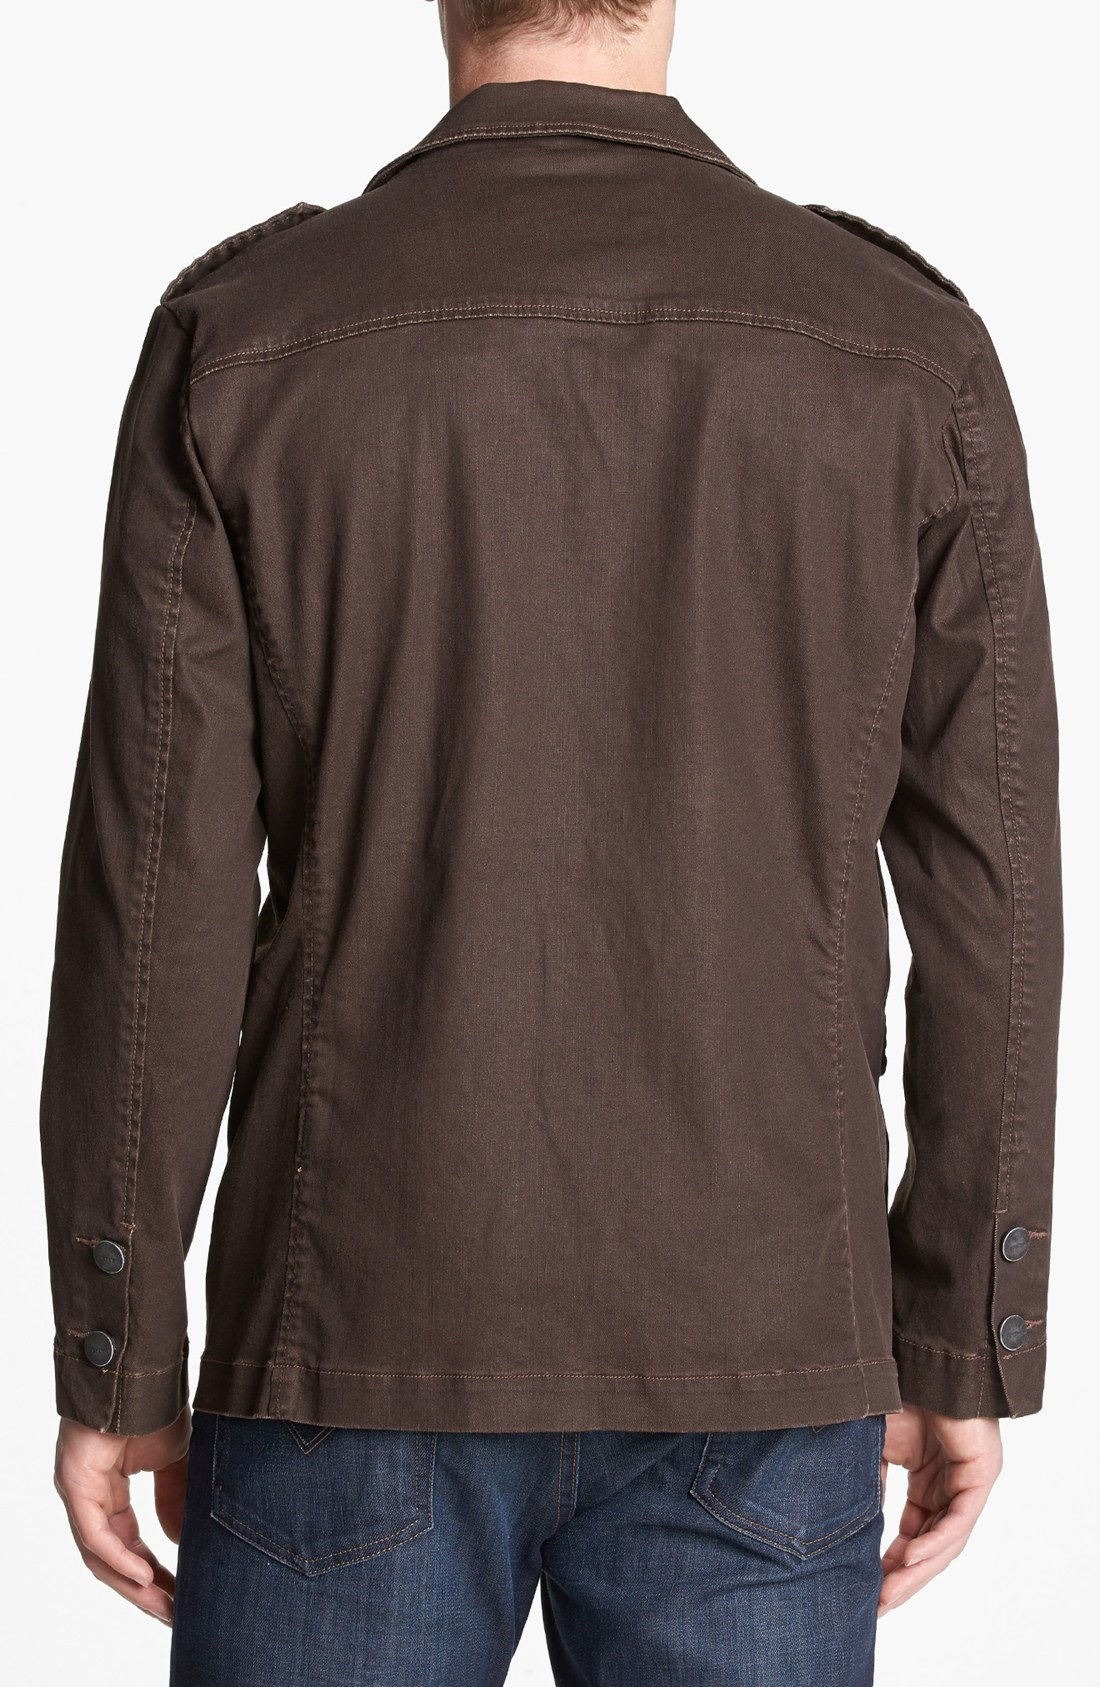 jeremiah dean denim jacket in brown for lyst